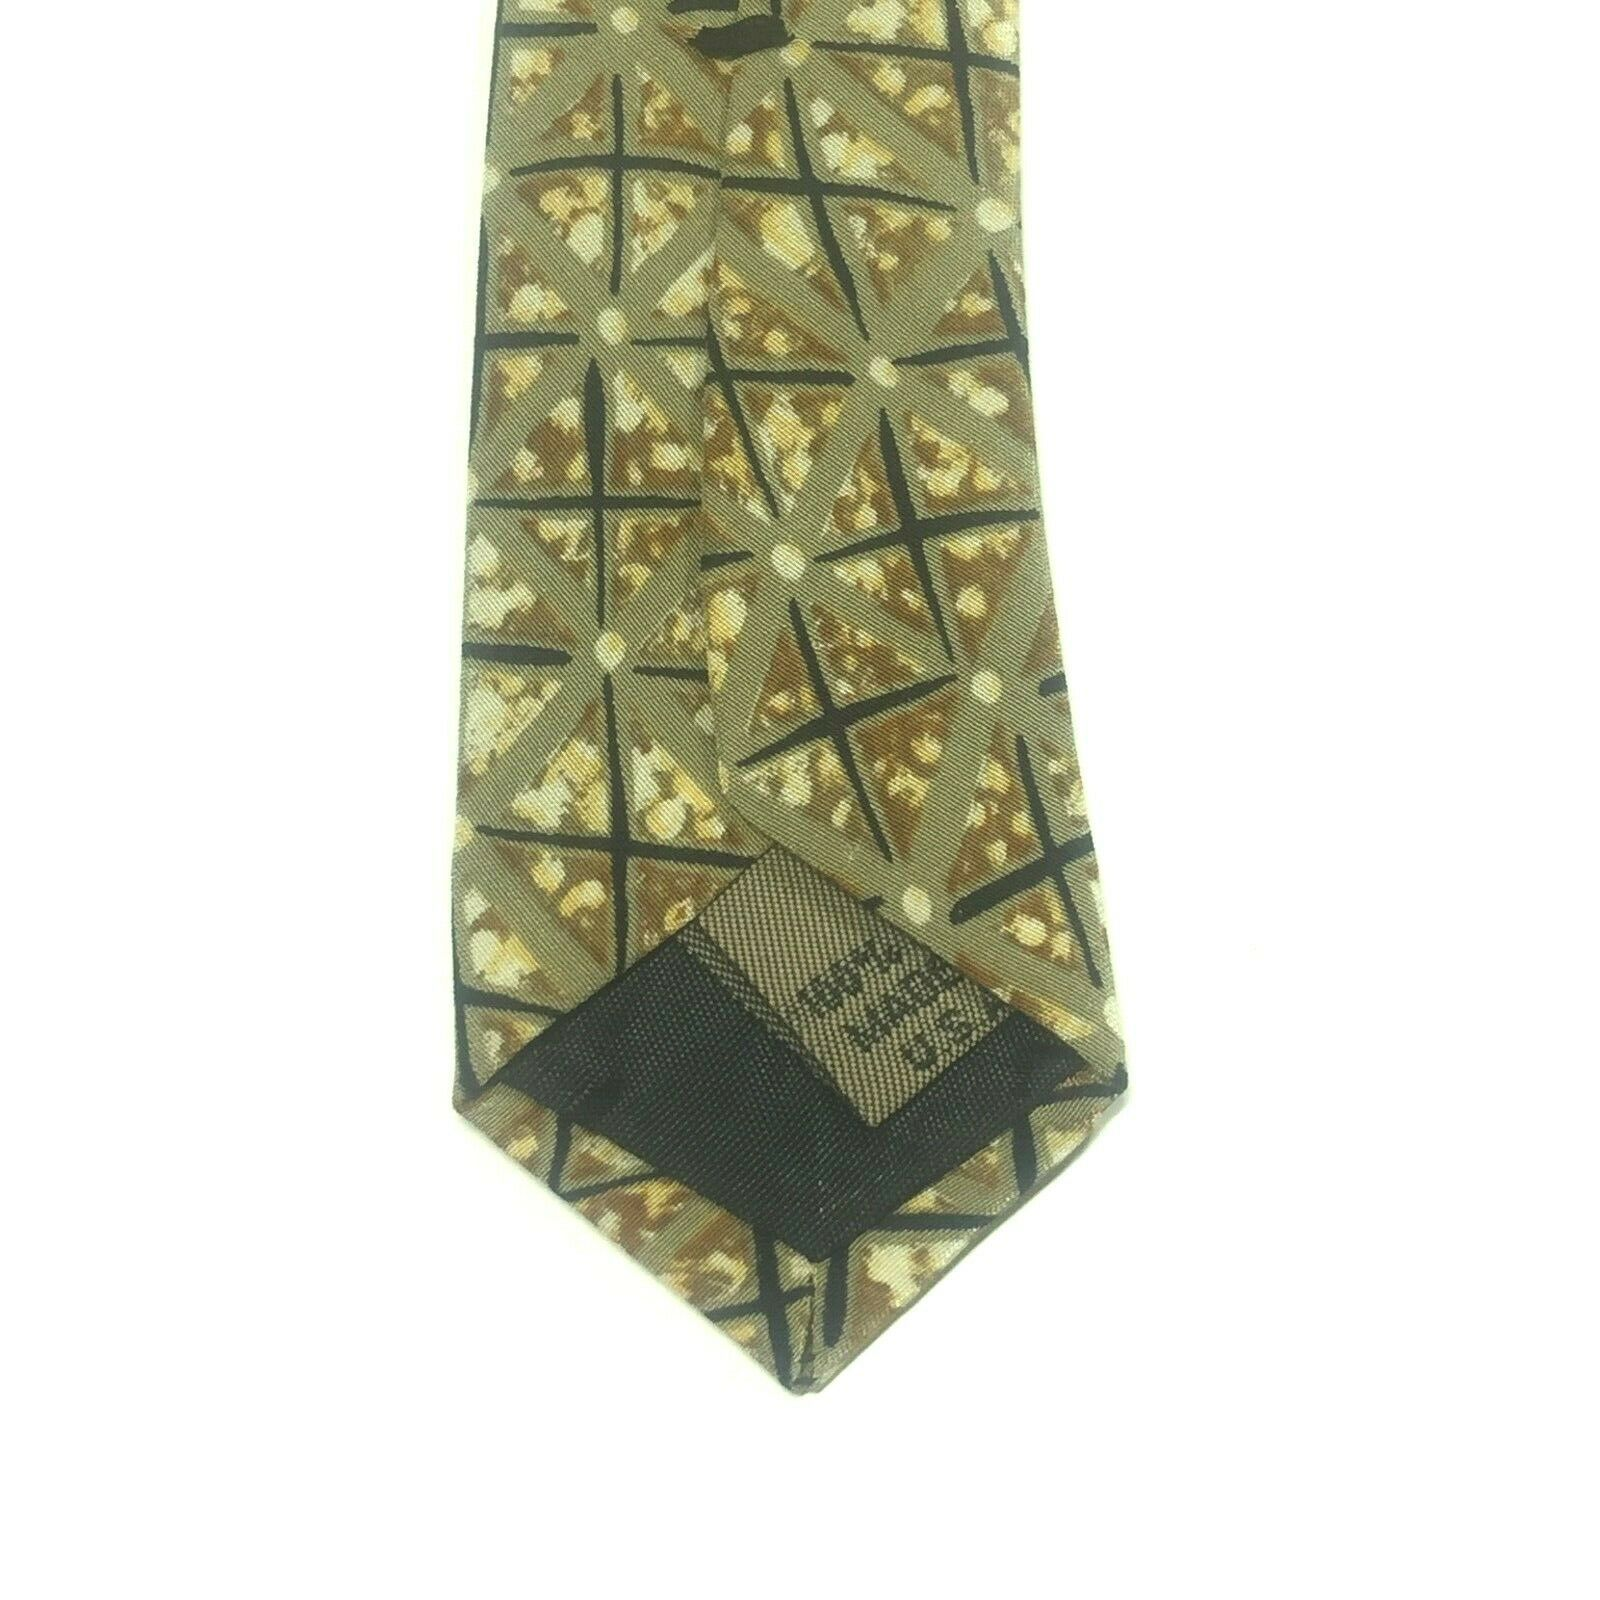 "Structure Men's Tie, 3.75"" X 58"" Necktie, 100% Silk, Brown Geometric Print image 4"